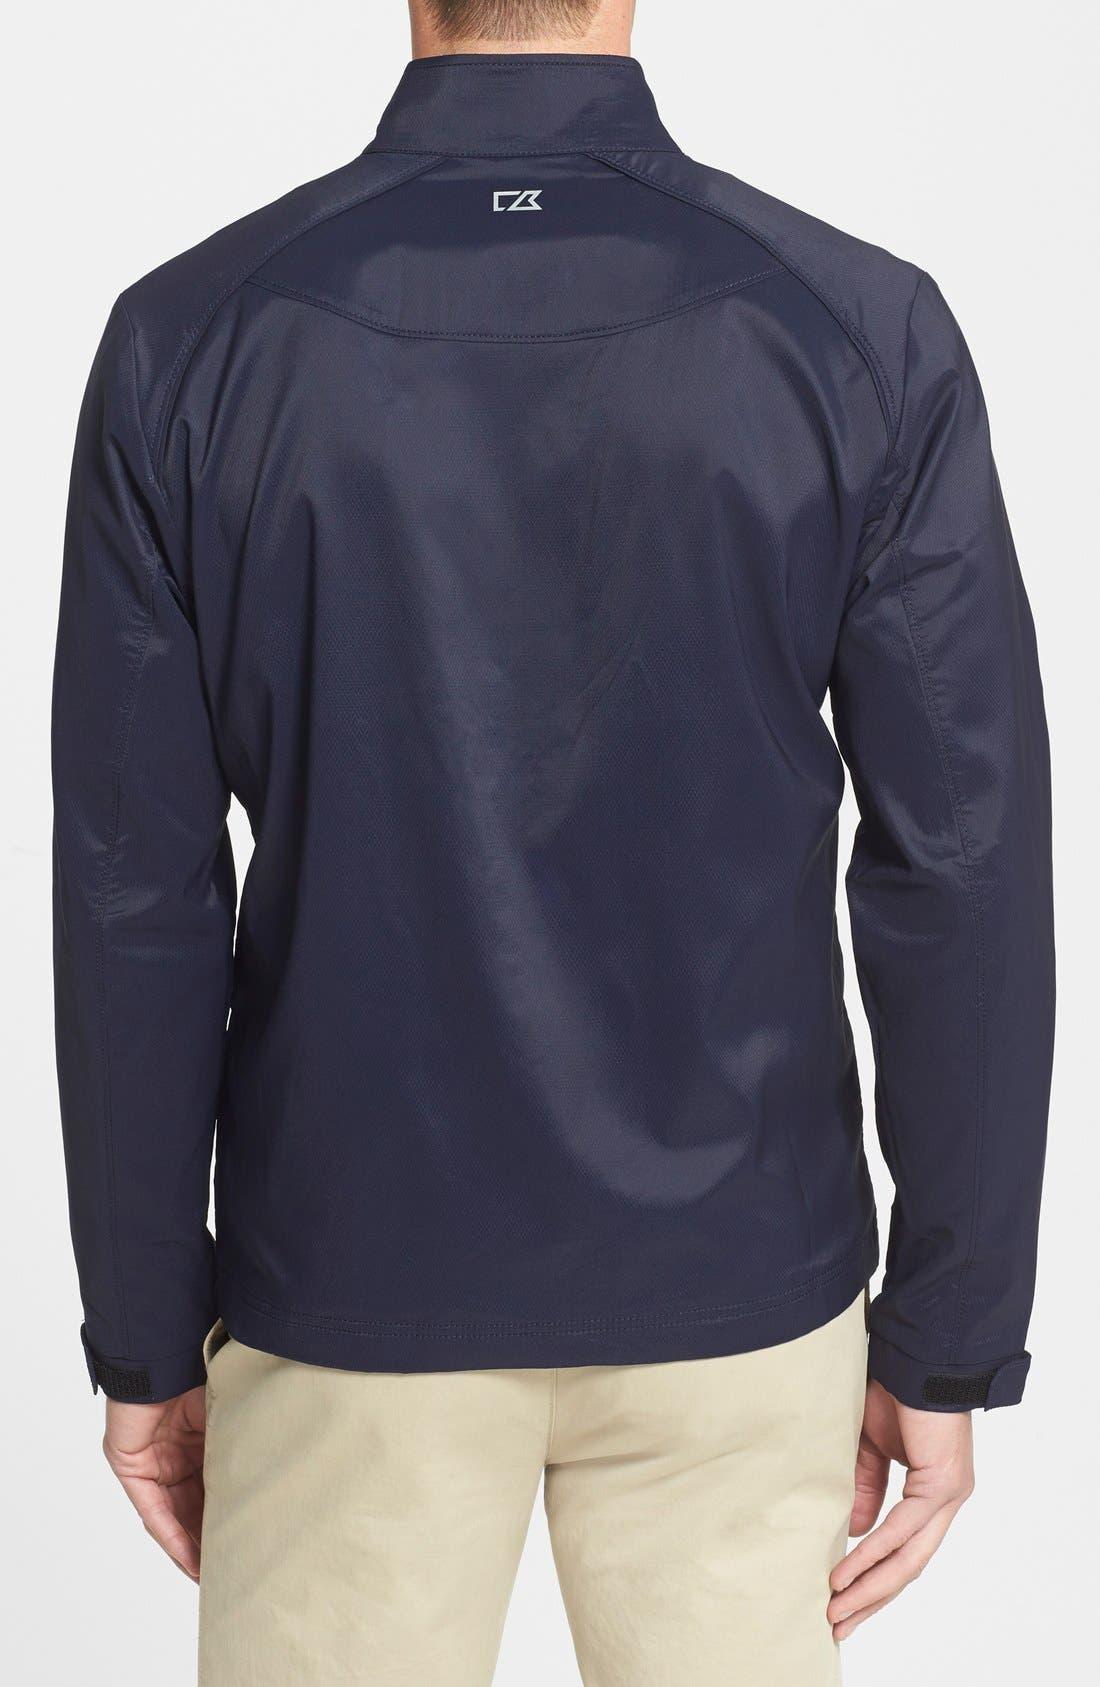 Blakely WeatherTec<sup>®</sup> Wind & Water Resistant Full Zip Jacket,                             Alternate thumbnail 3, color,                             LIBERTY NAVY